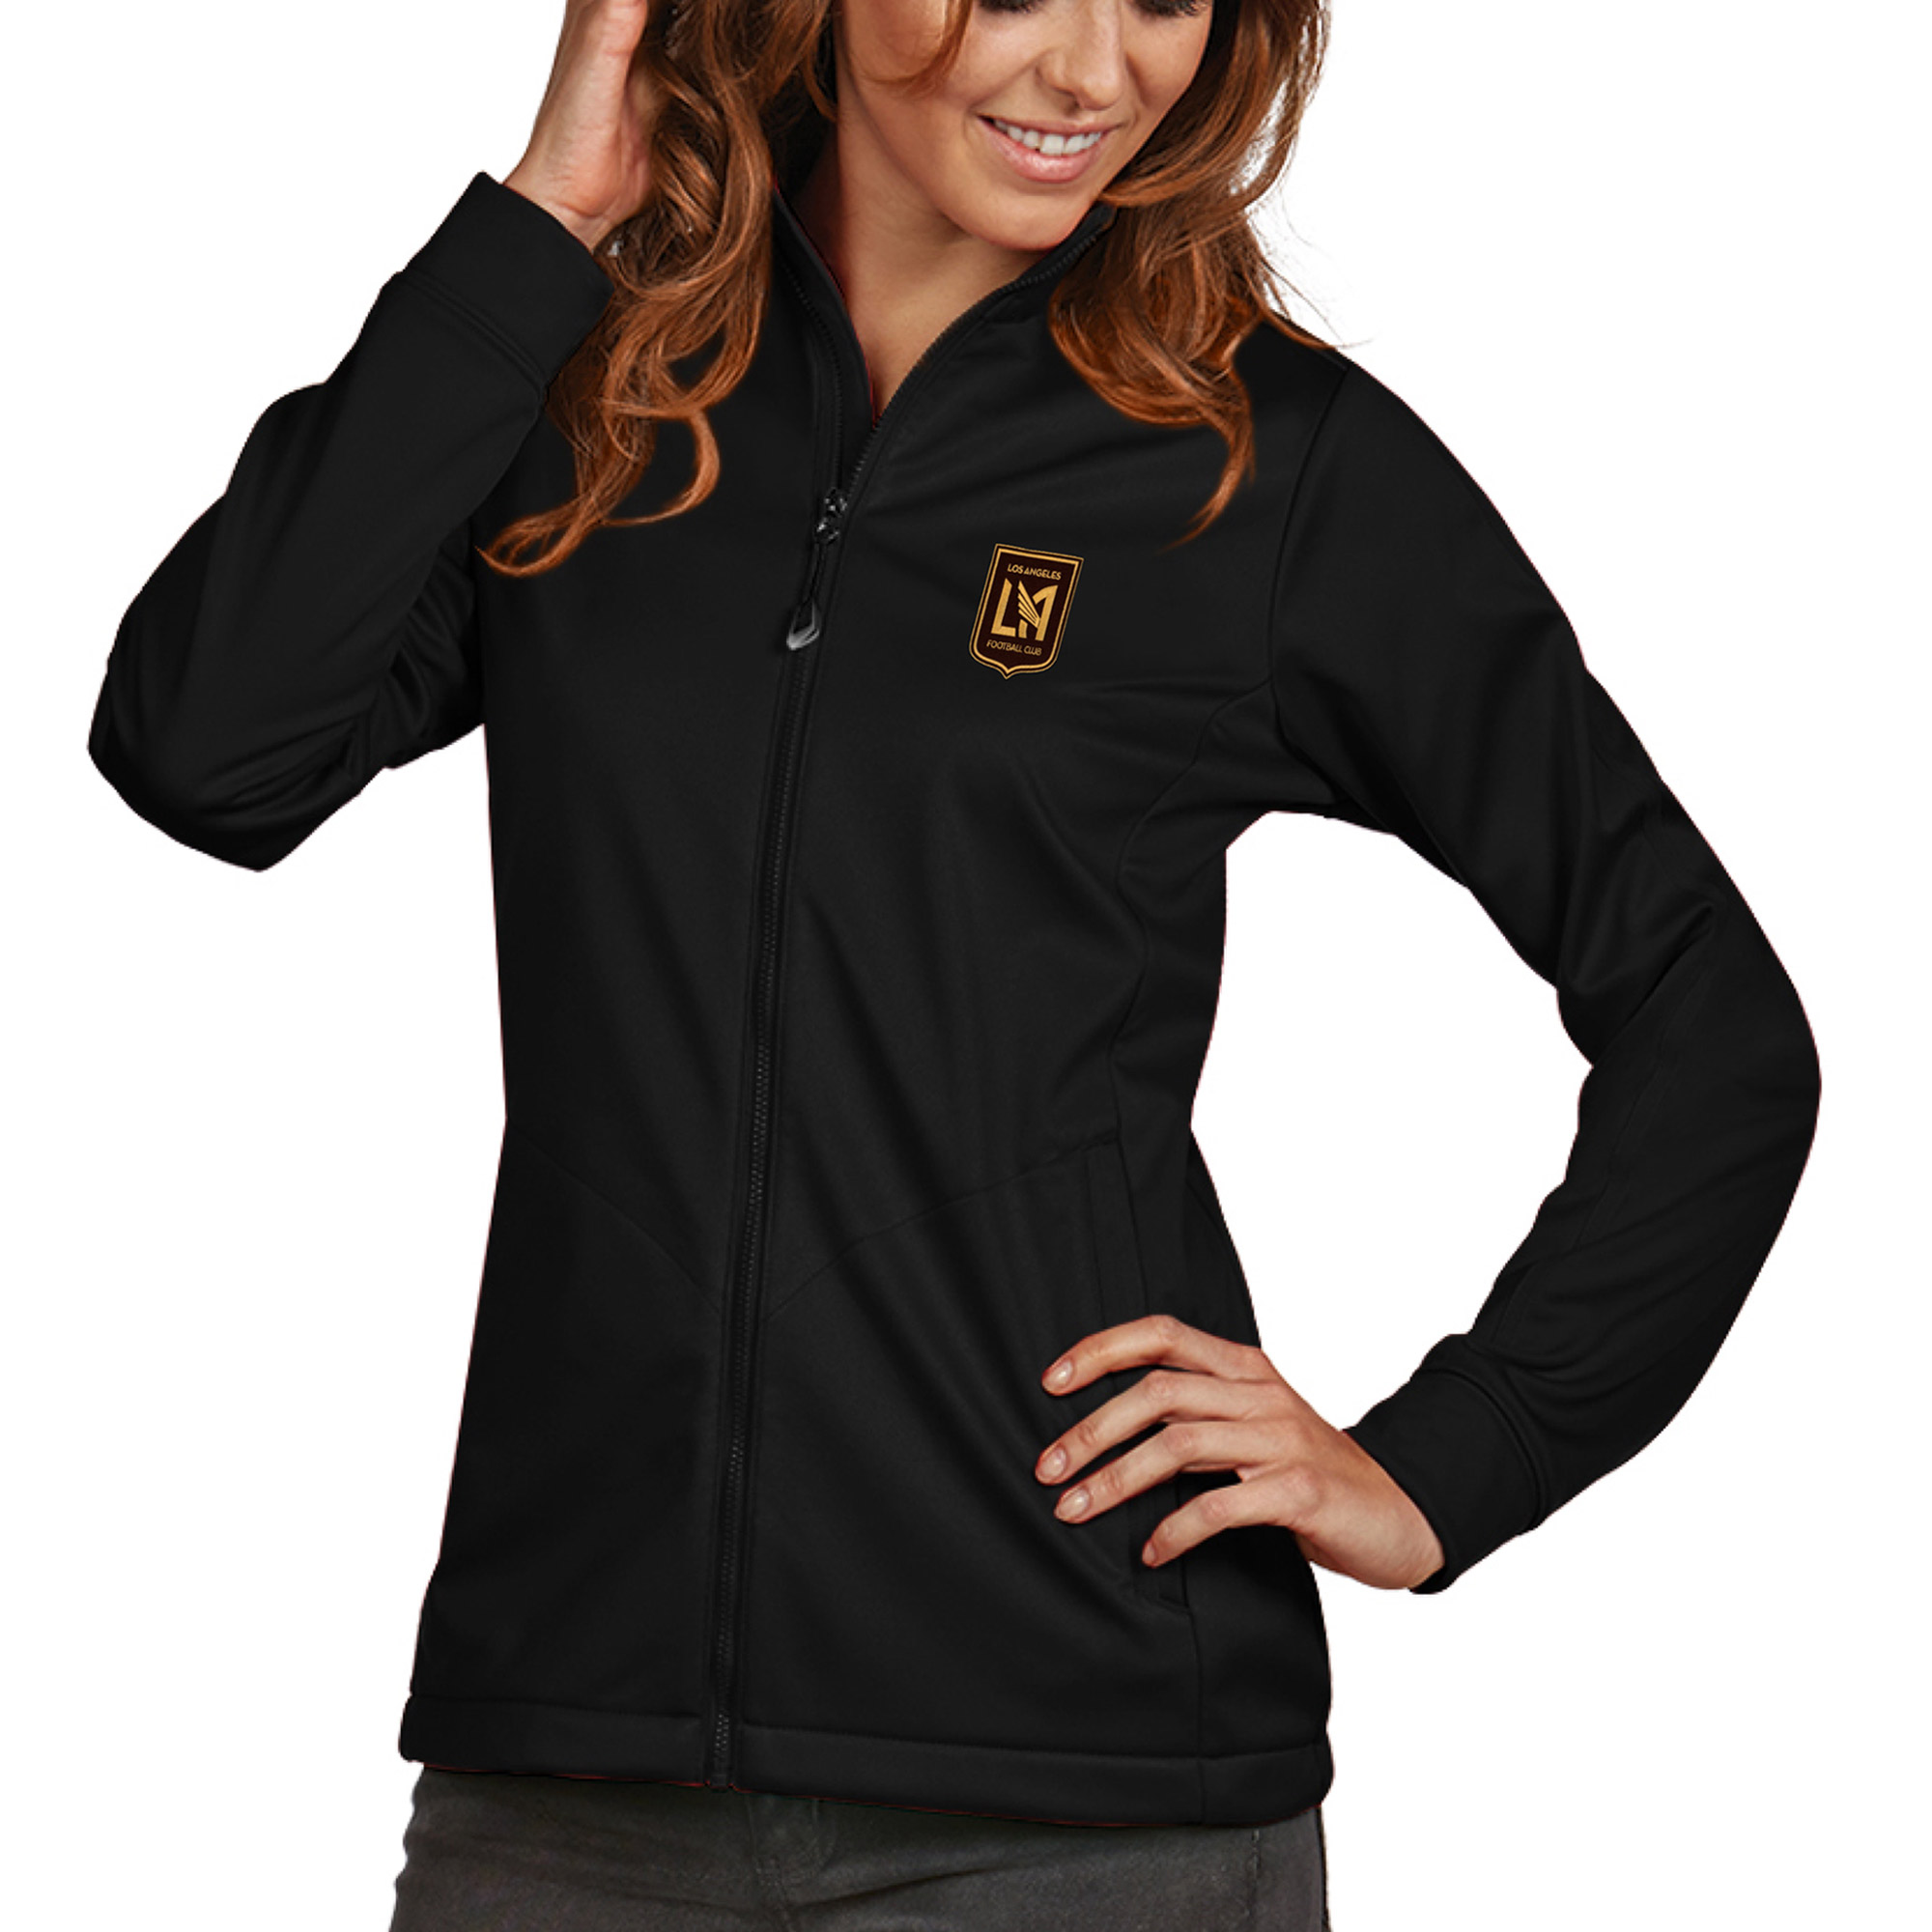 LAFC Antigua Women's Golf Full Zip Jacket - Black